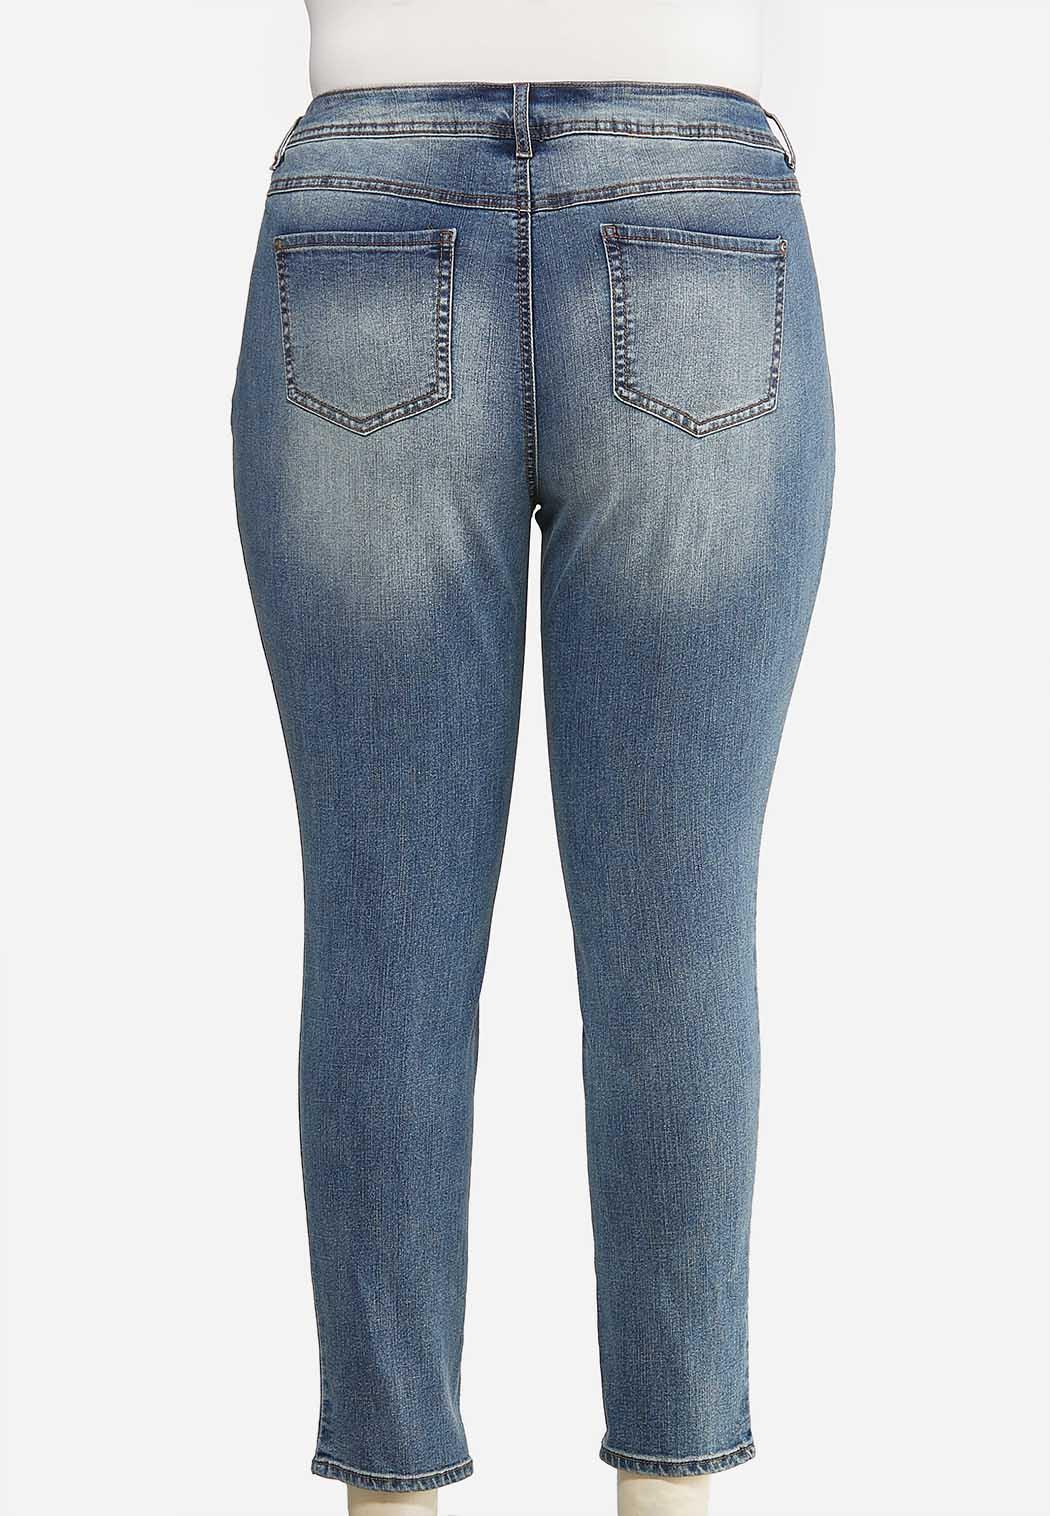 Plus Petite Faded Skinny Ankle Jeans (Item #44072158)